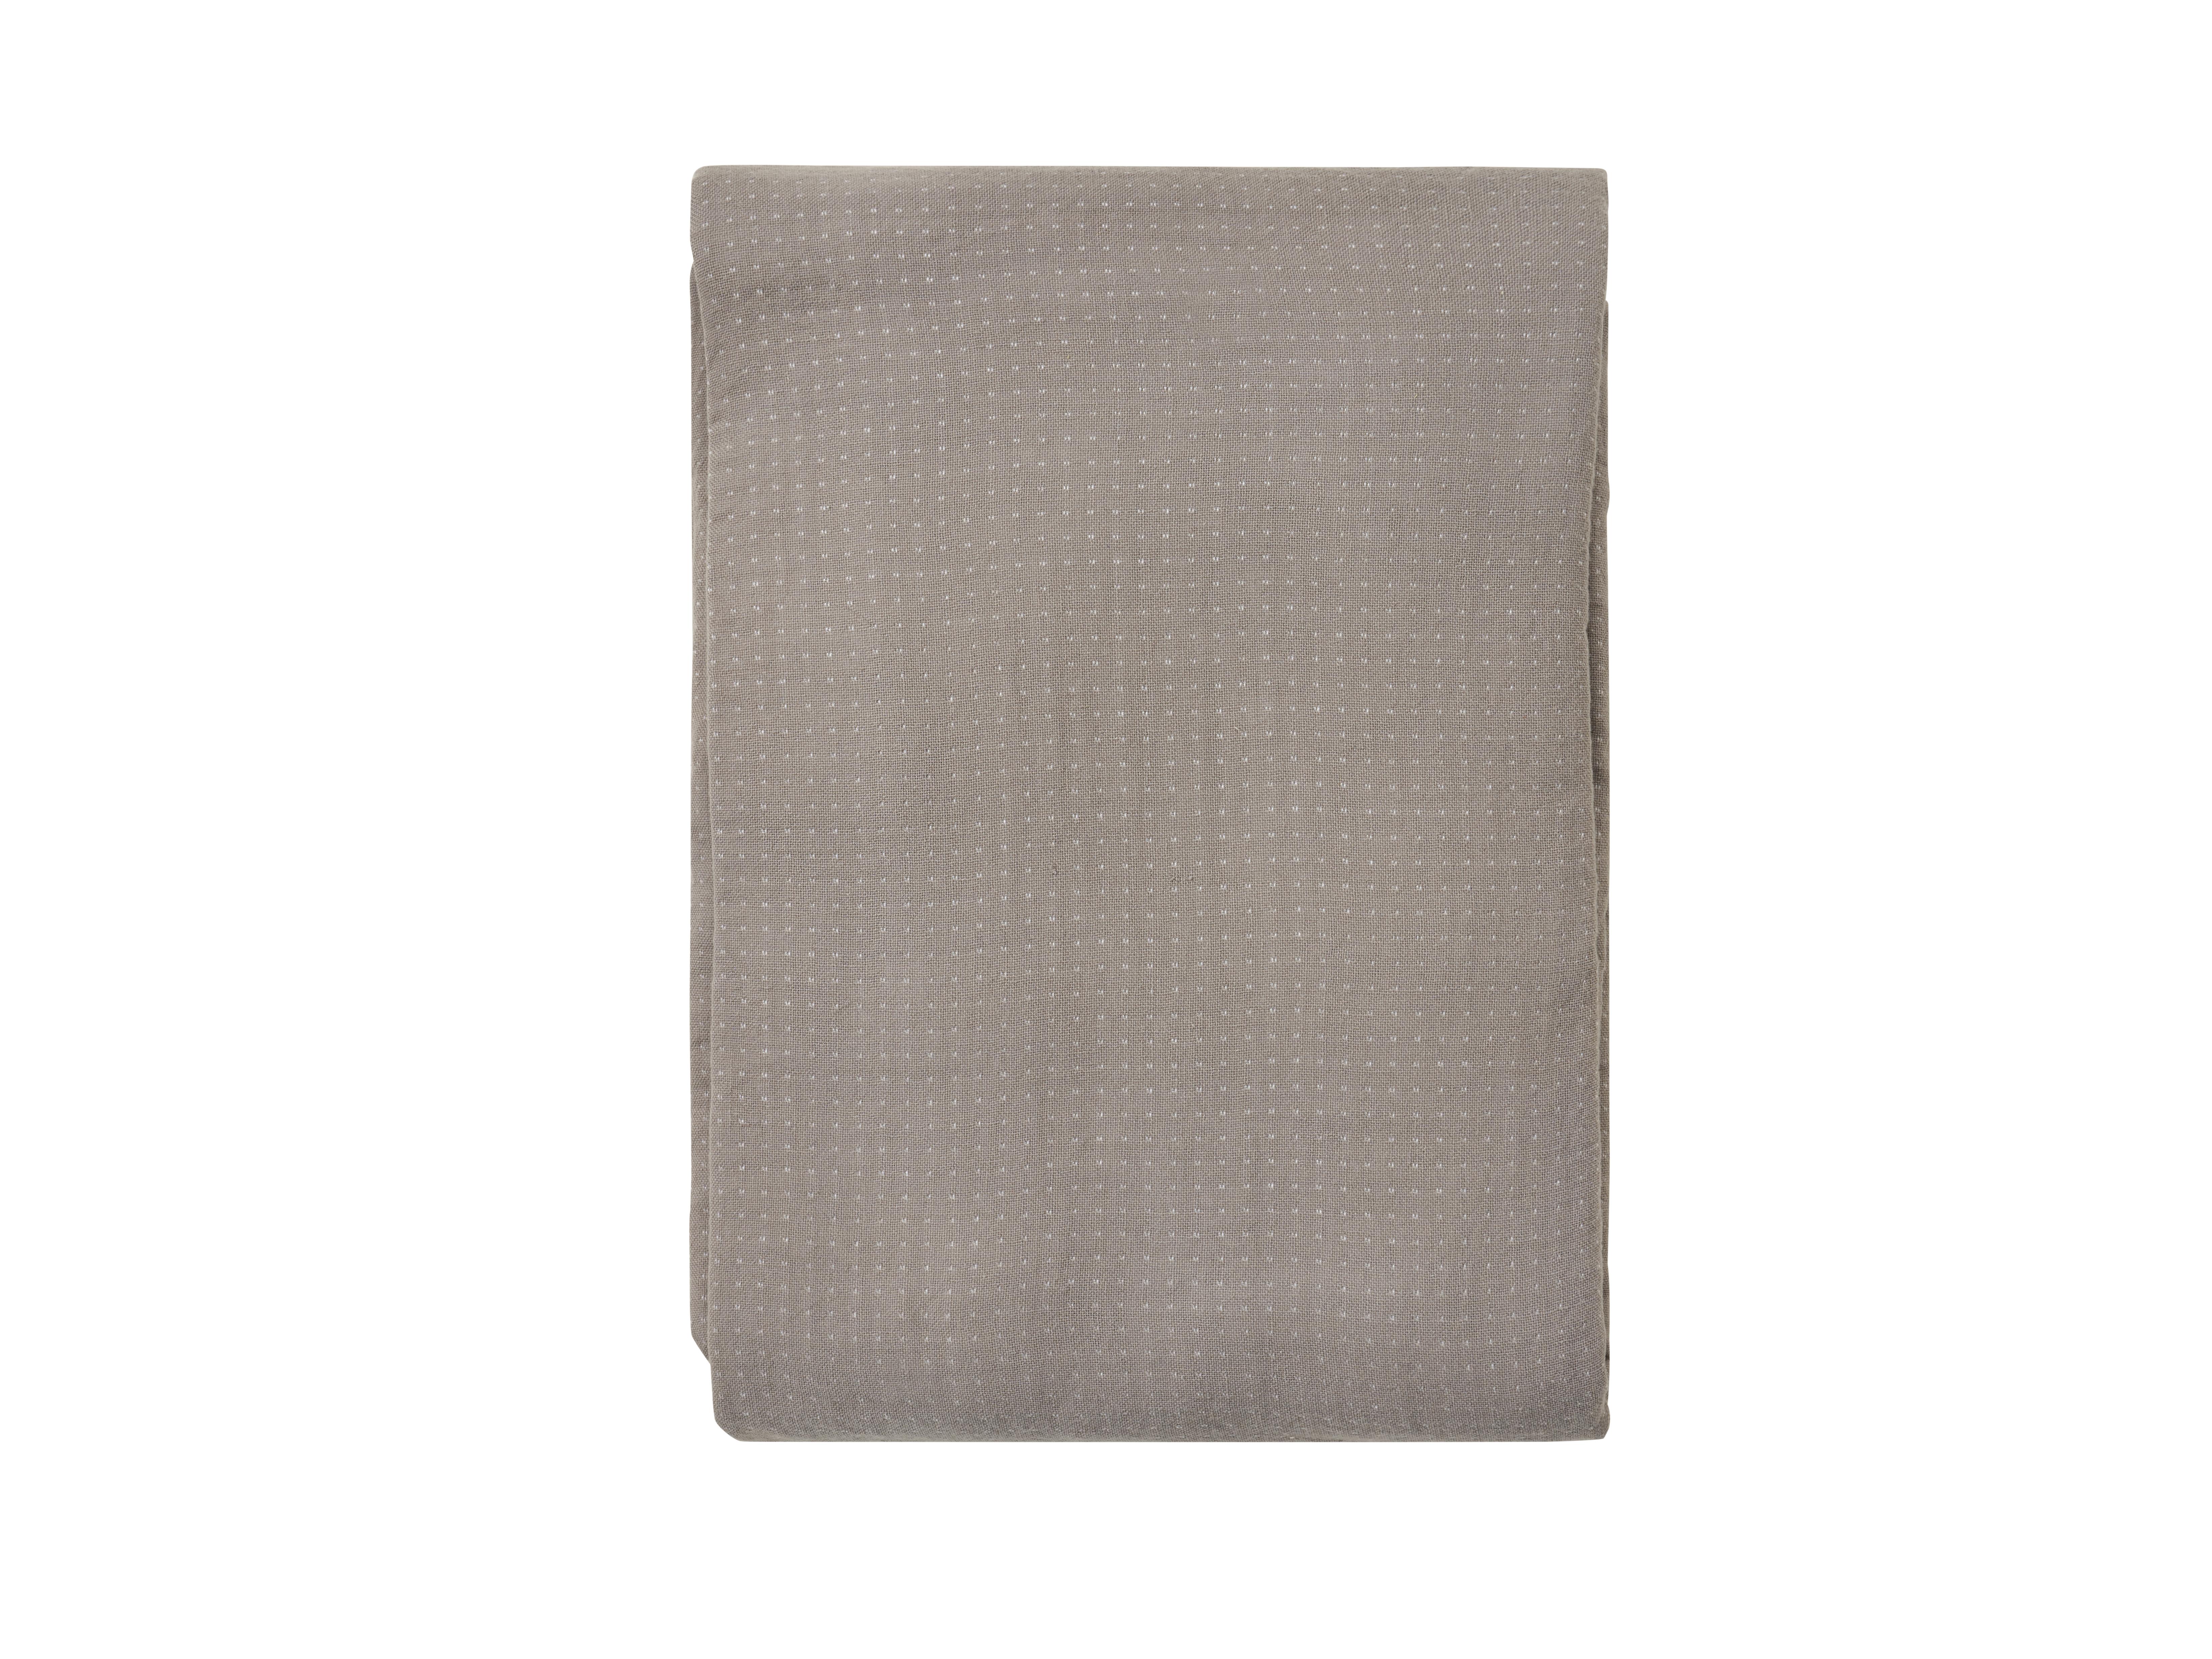 Södahl Point sengetæppe, 200x260 cm, grå